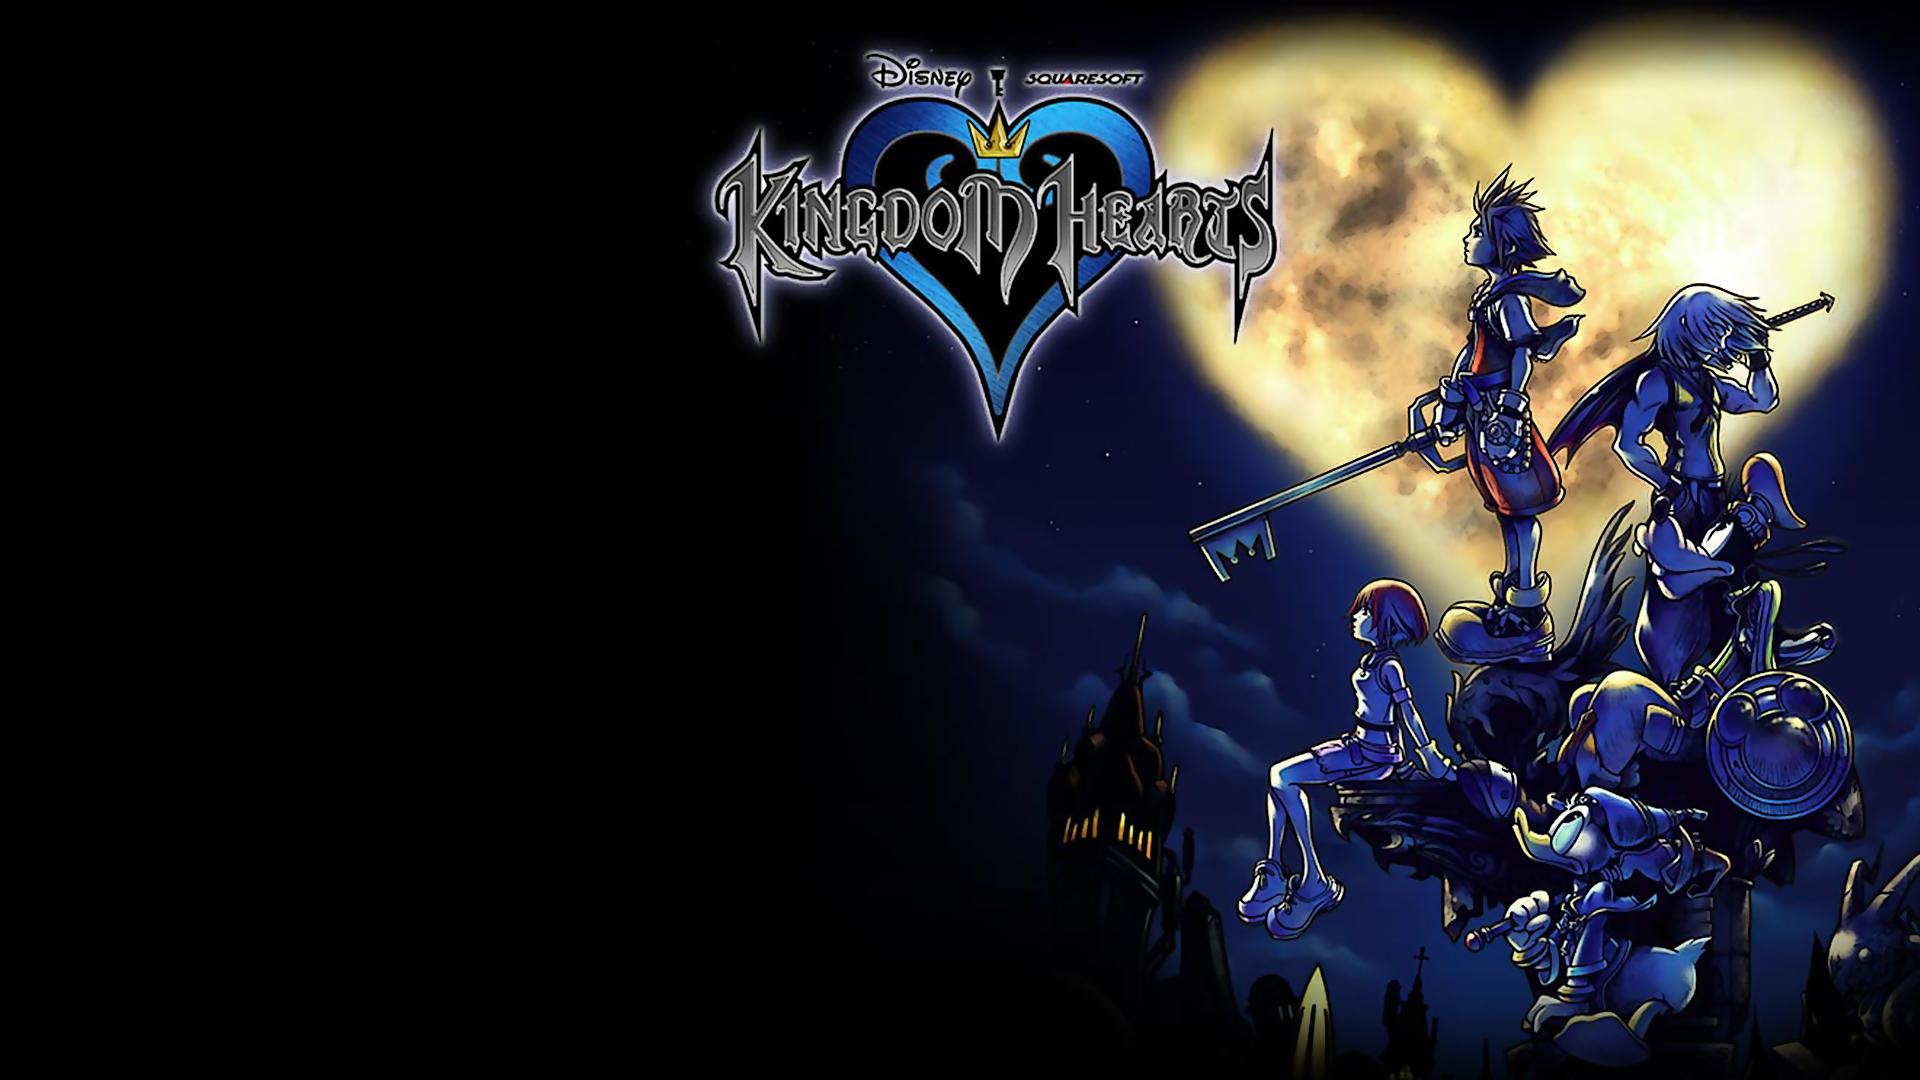 Download Kingdom Hearts Wallpaper 1920x1080 Wallpoper 1920x1080